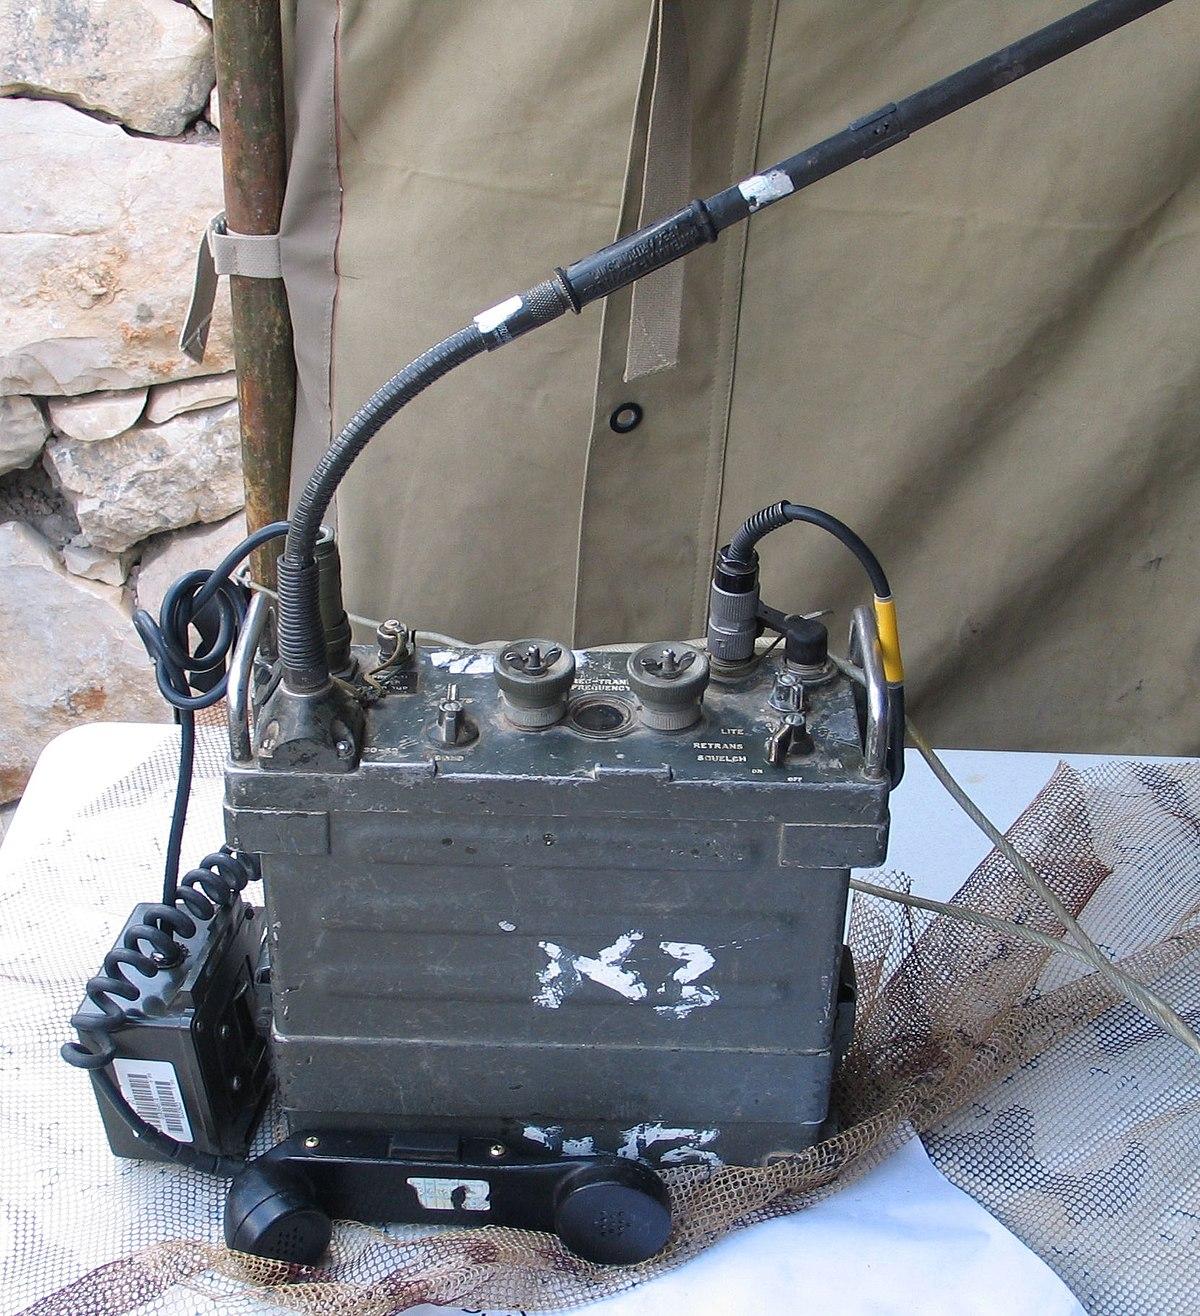 AN/PRC-77 Portable Transceiver - Wikipedia